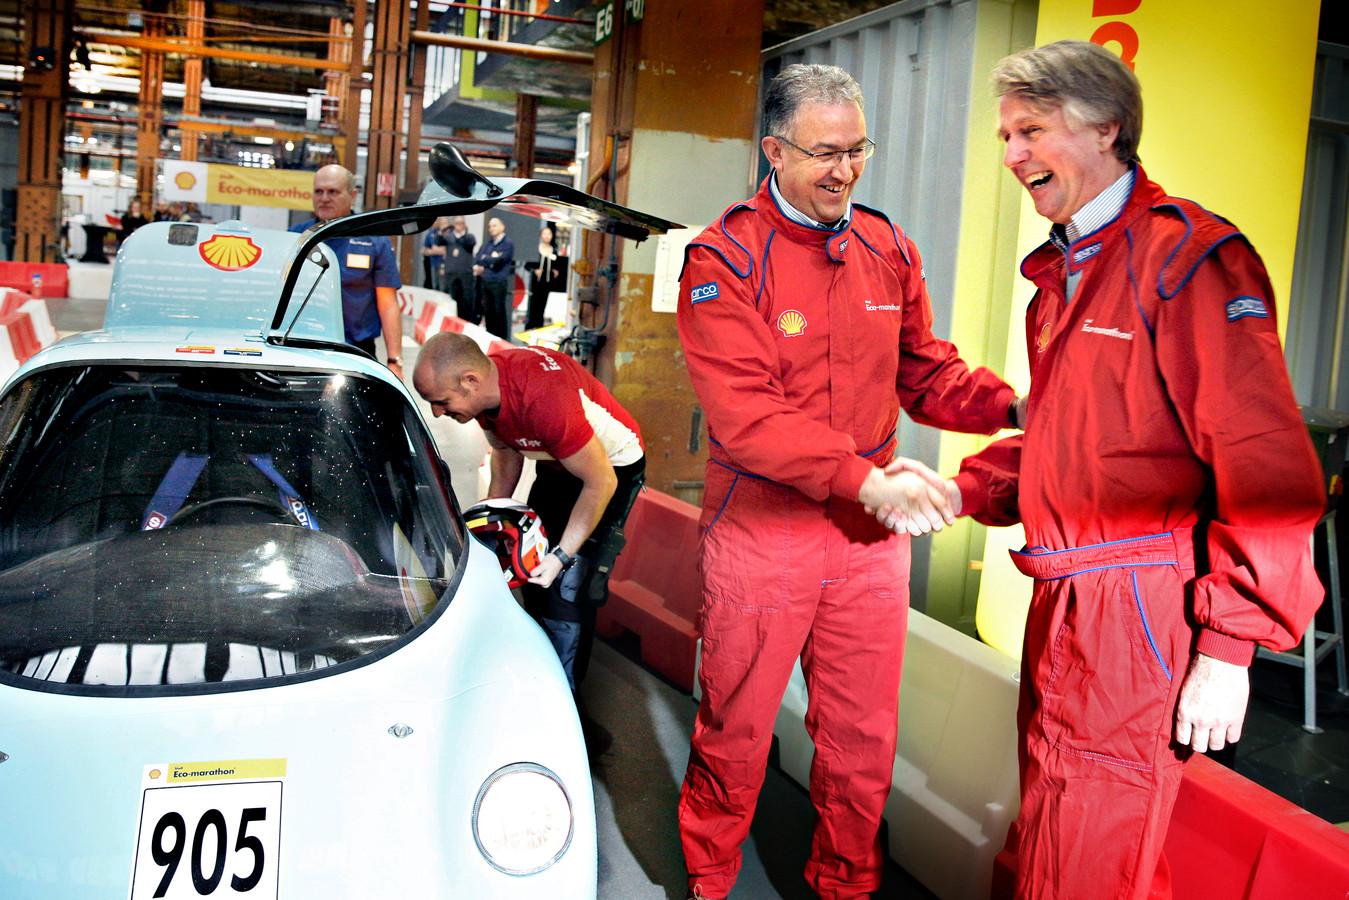 Met Rotterdamse burgemeester Ahmed Aboutaleb trapt Shell Nederland baas Dick Benschop in 2014 de Shell Eco-marathon Europa af op de RDM campus te Rotterdam.